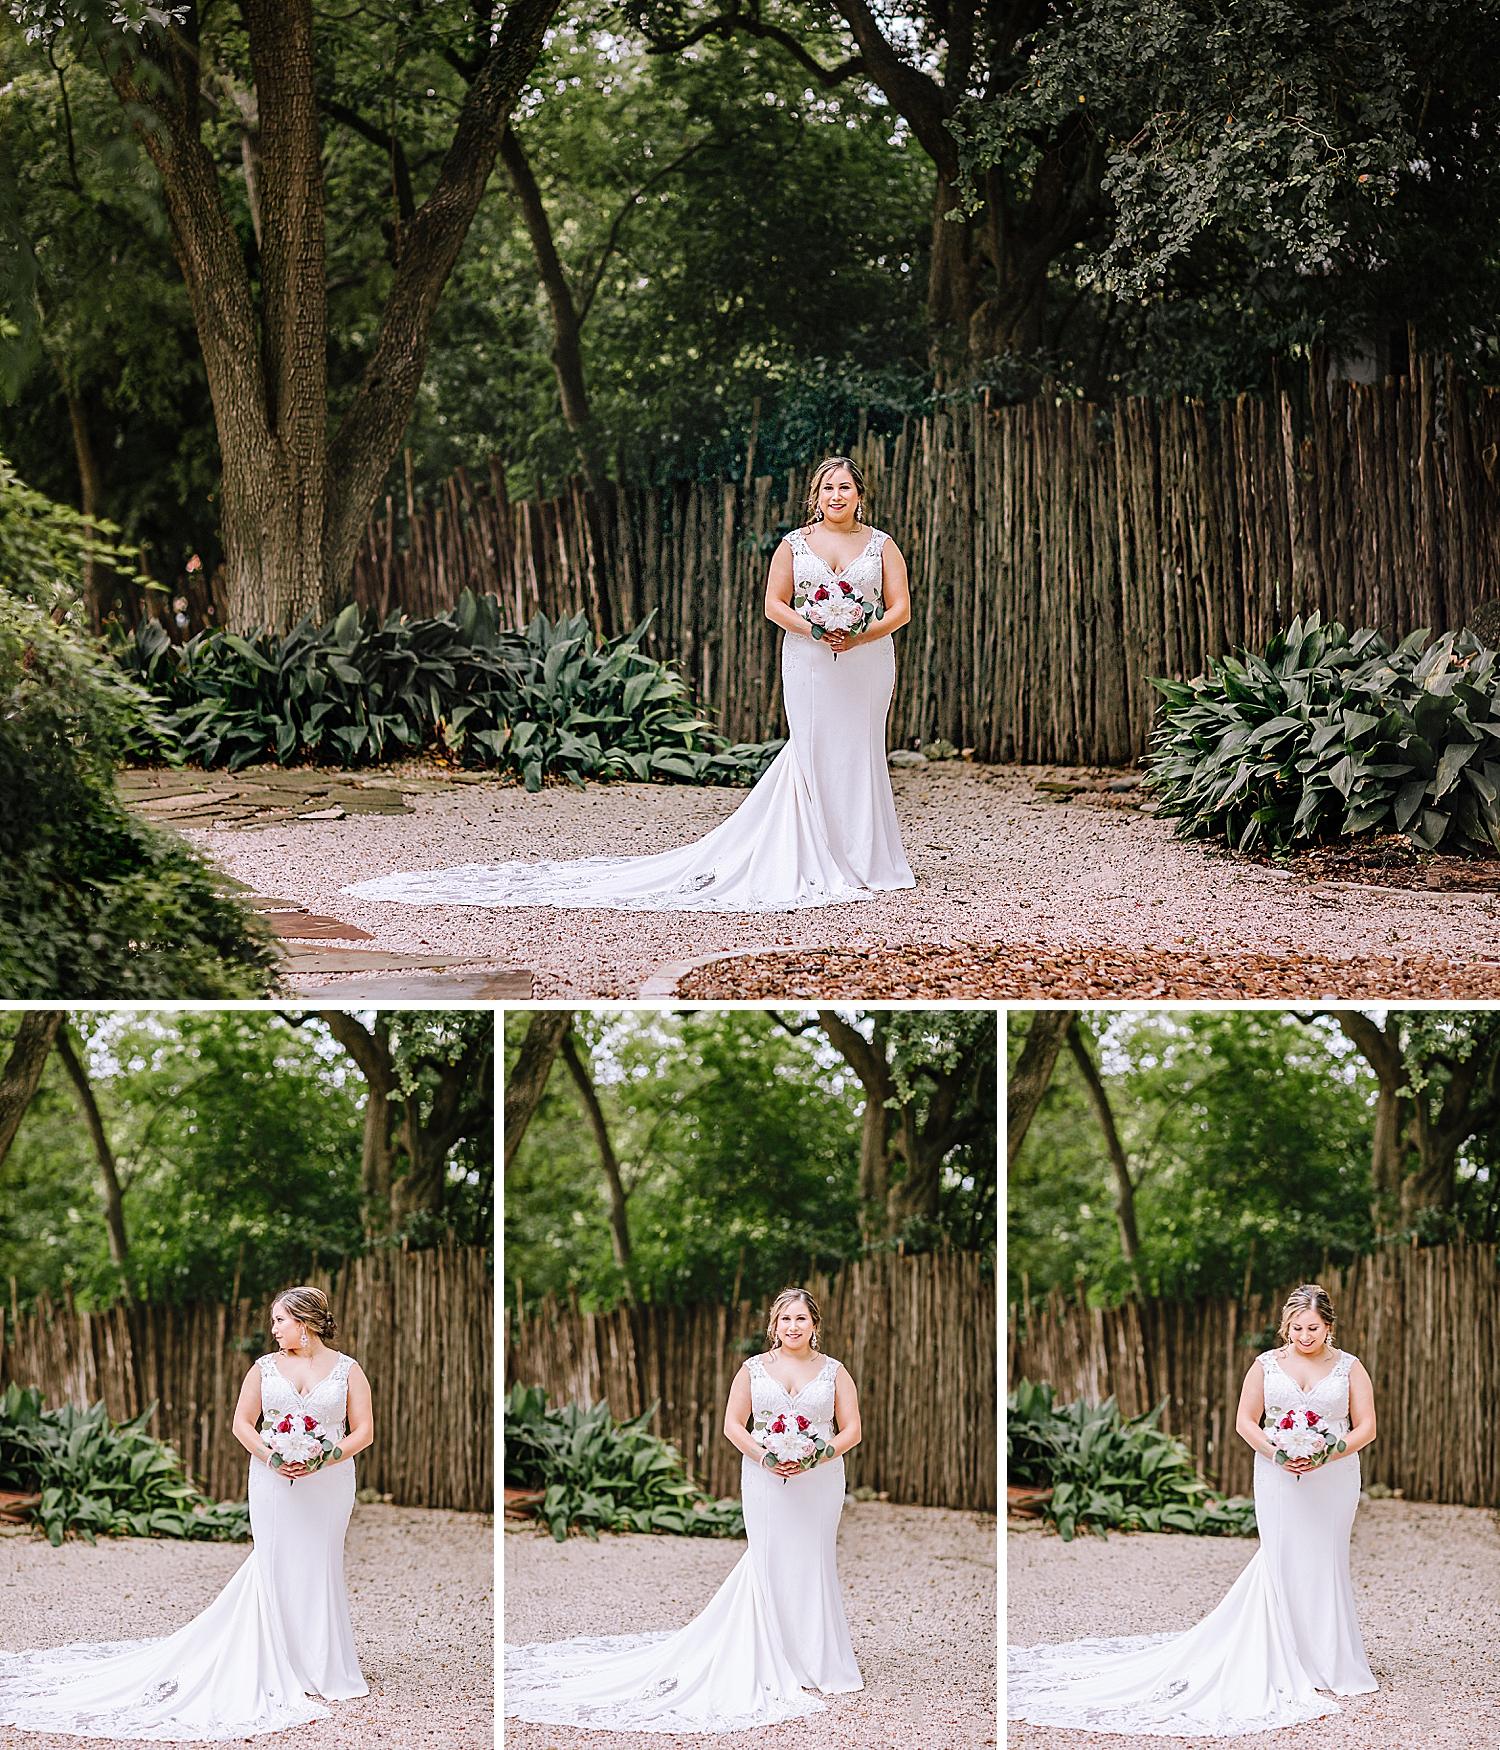 Carly-Barton-Photography-Gruene-Estate-Wedding-Photographer-New-Braunfels-Texas-Bridal-Session_0008.jpg